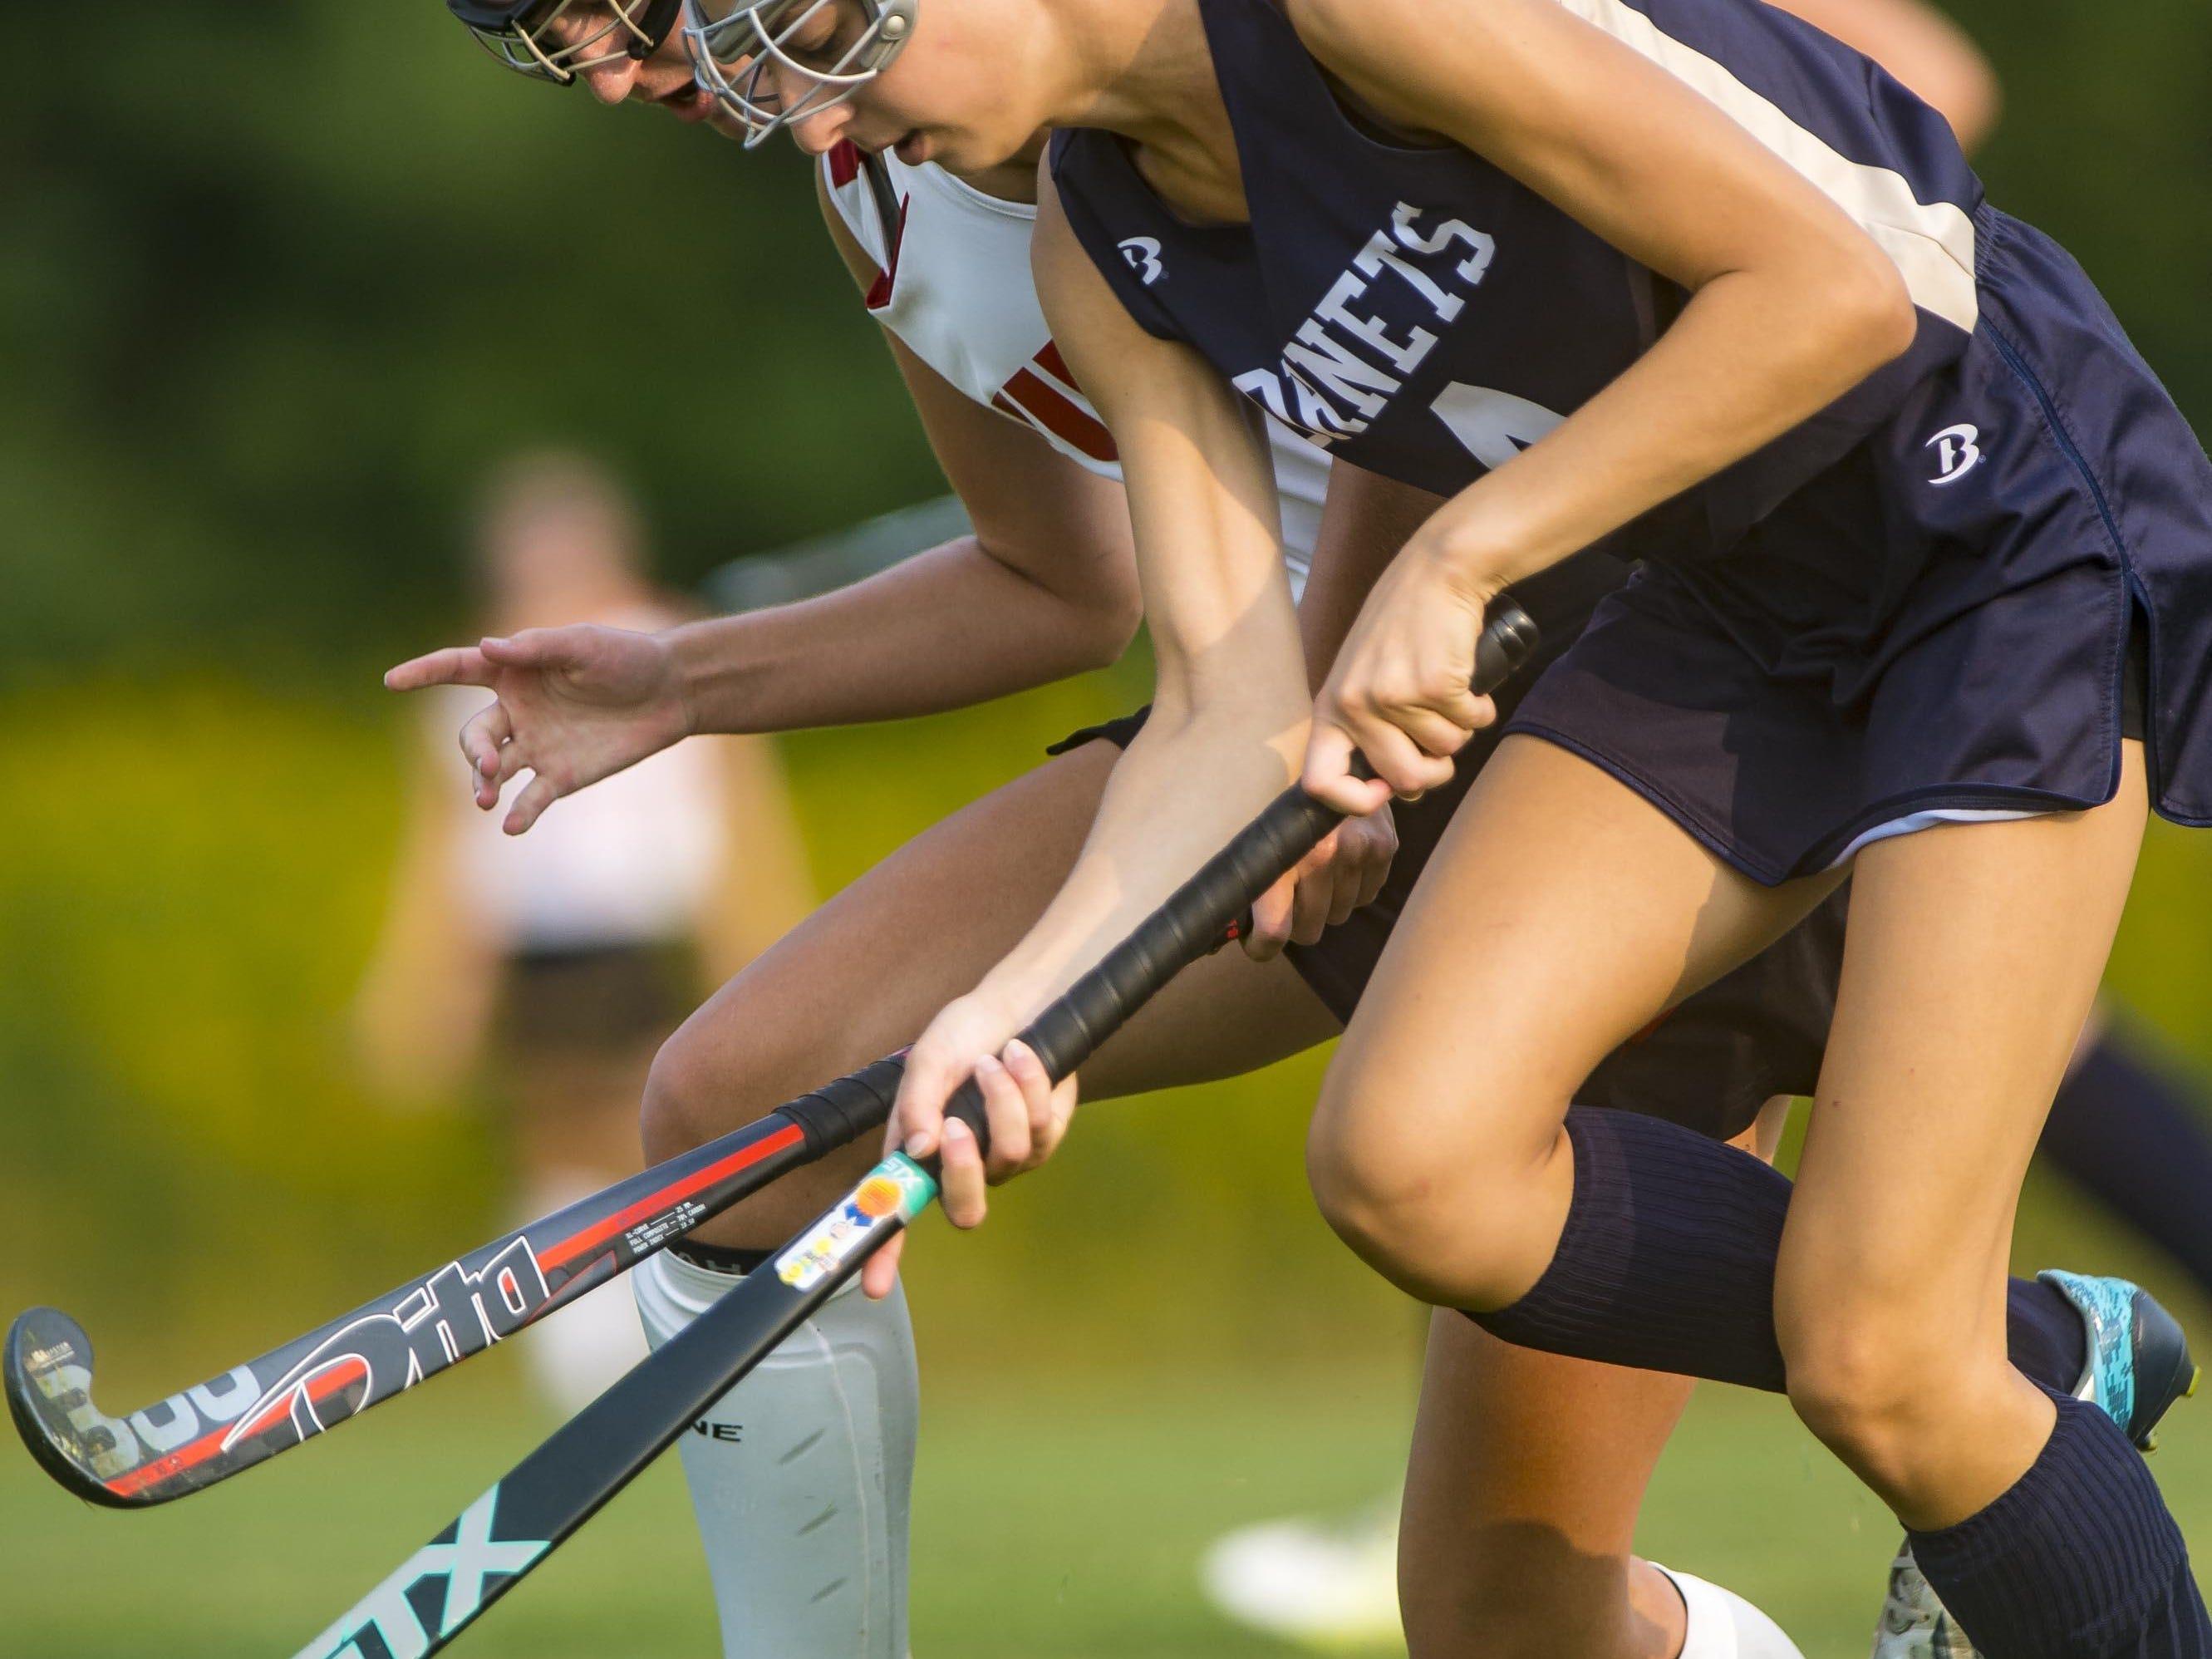 CVU's Taya LePrevost, left, shadows Essex's Alicia Russotti in Hinesburg on Wednesday, September 2.